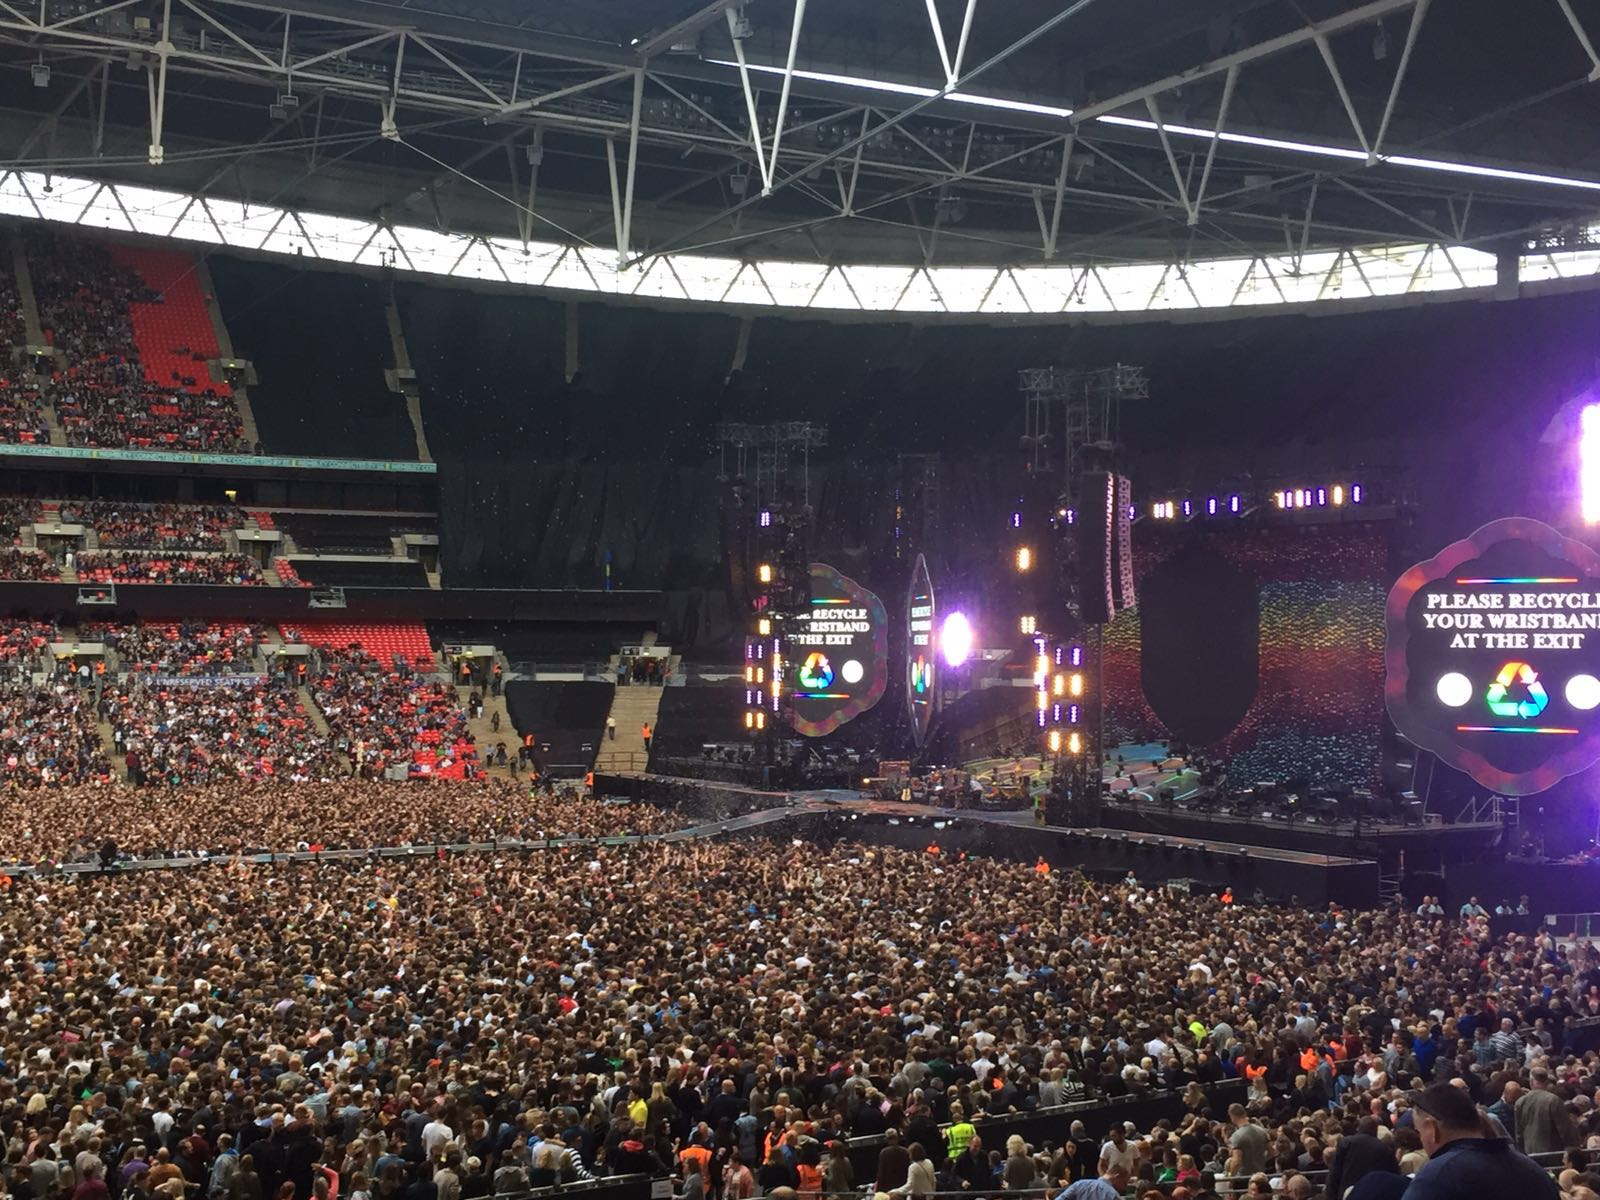 Al concerto dei Coldplay - La Pinella